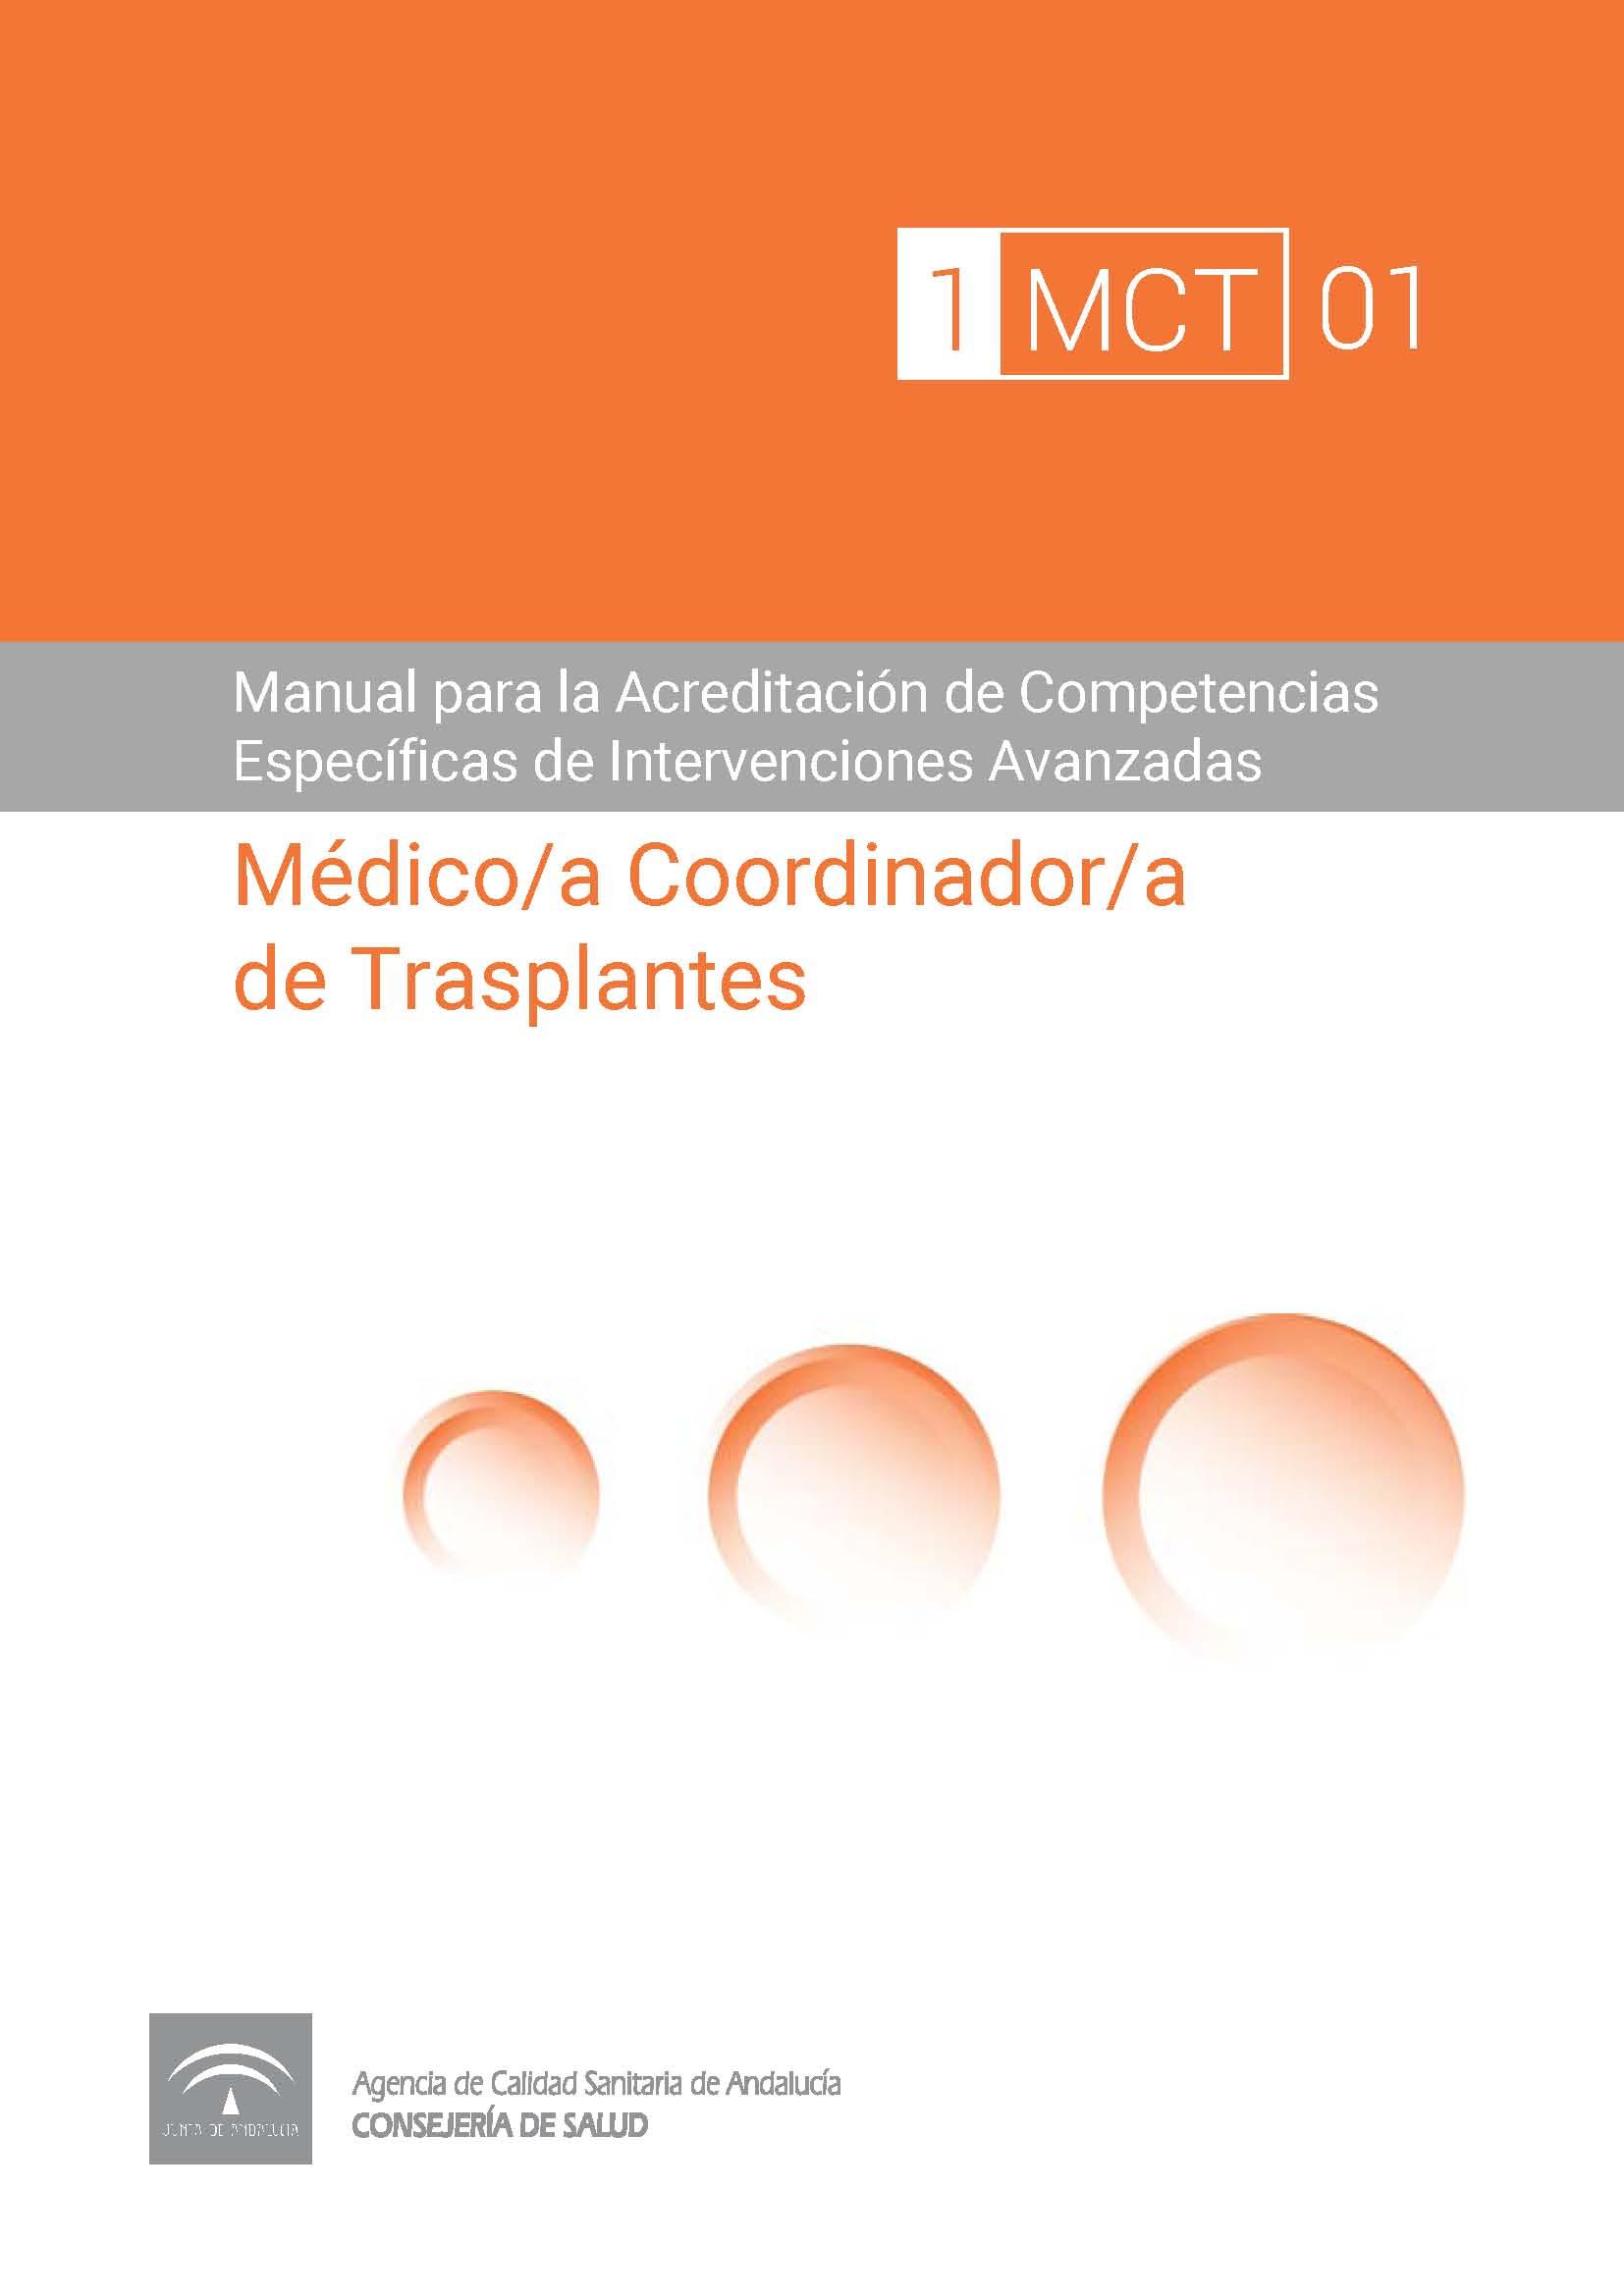 Médico/a Coordinador/a de Trasplantes